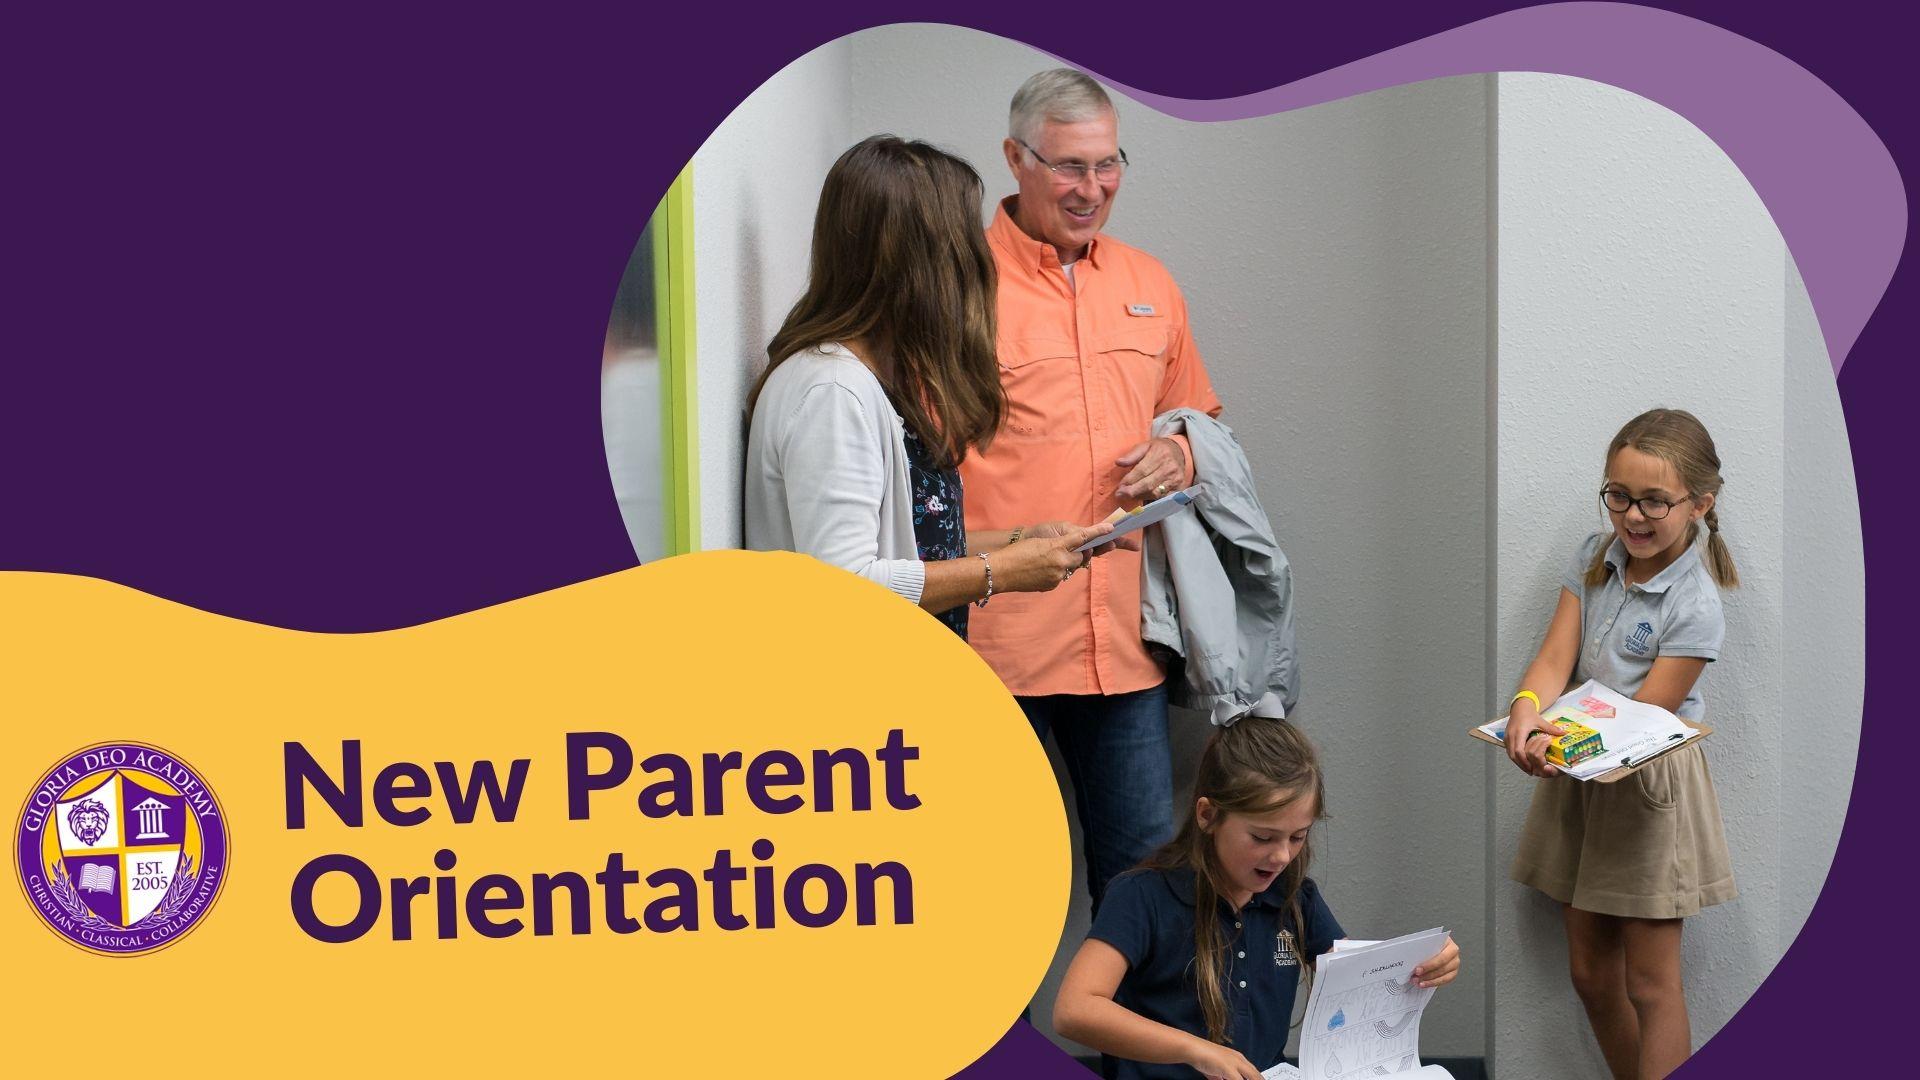 GDA New Parent Orientation 2021